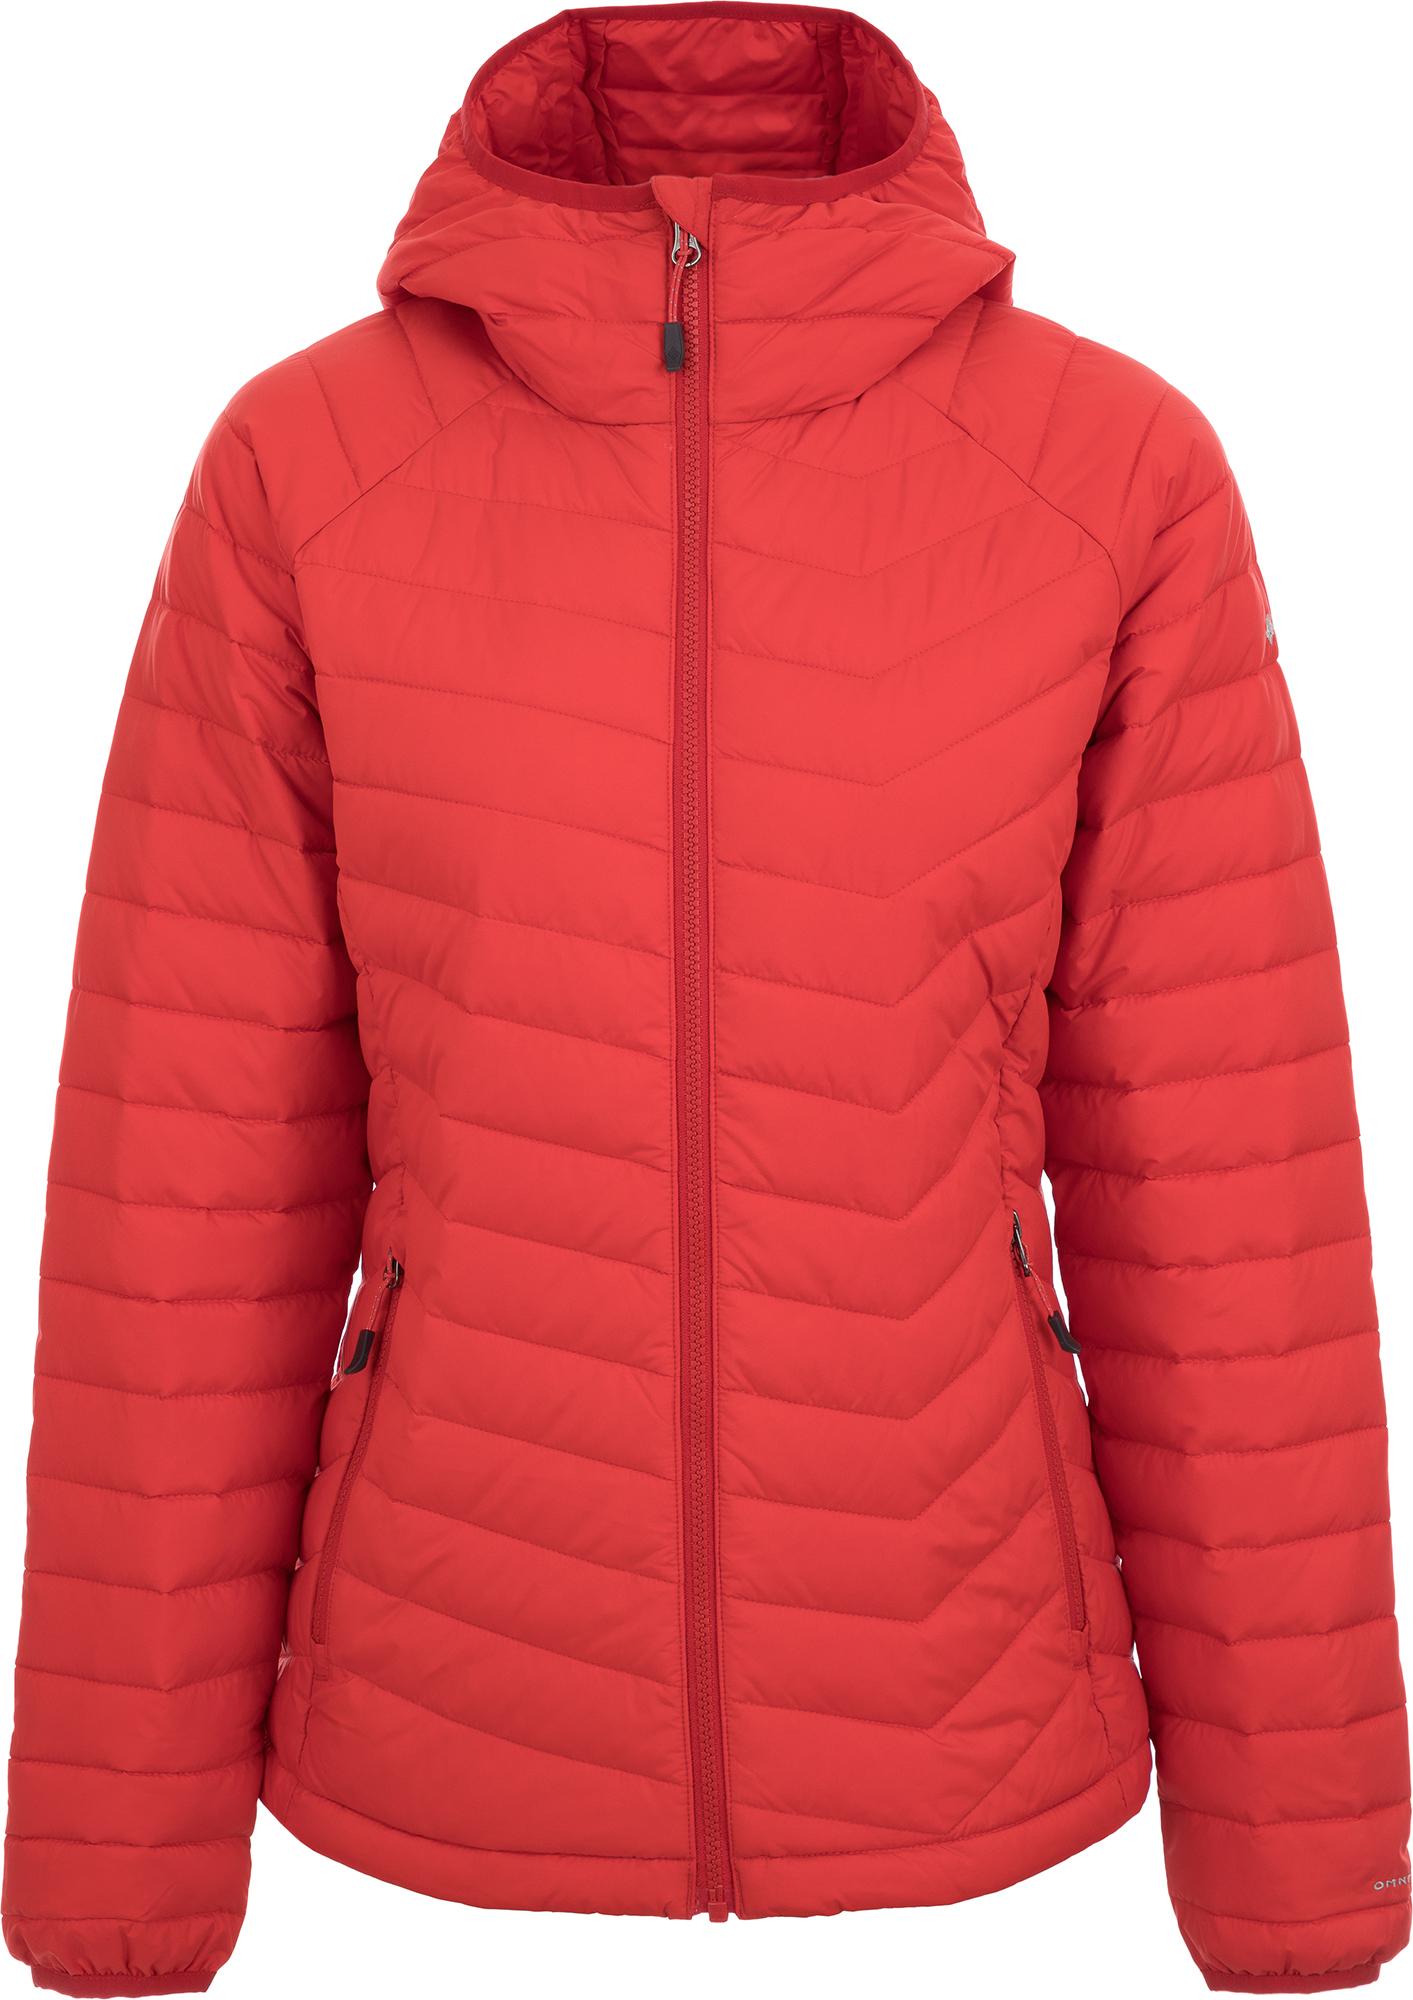 Columbia Куртка утепленная женская Columbia Powder Lite, размер 50